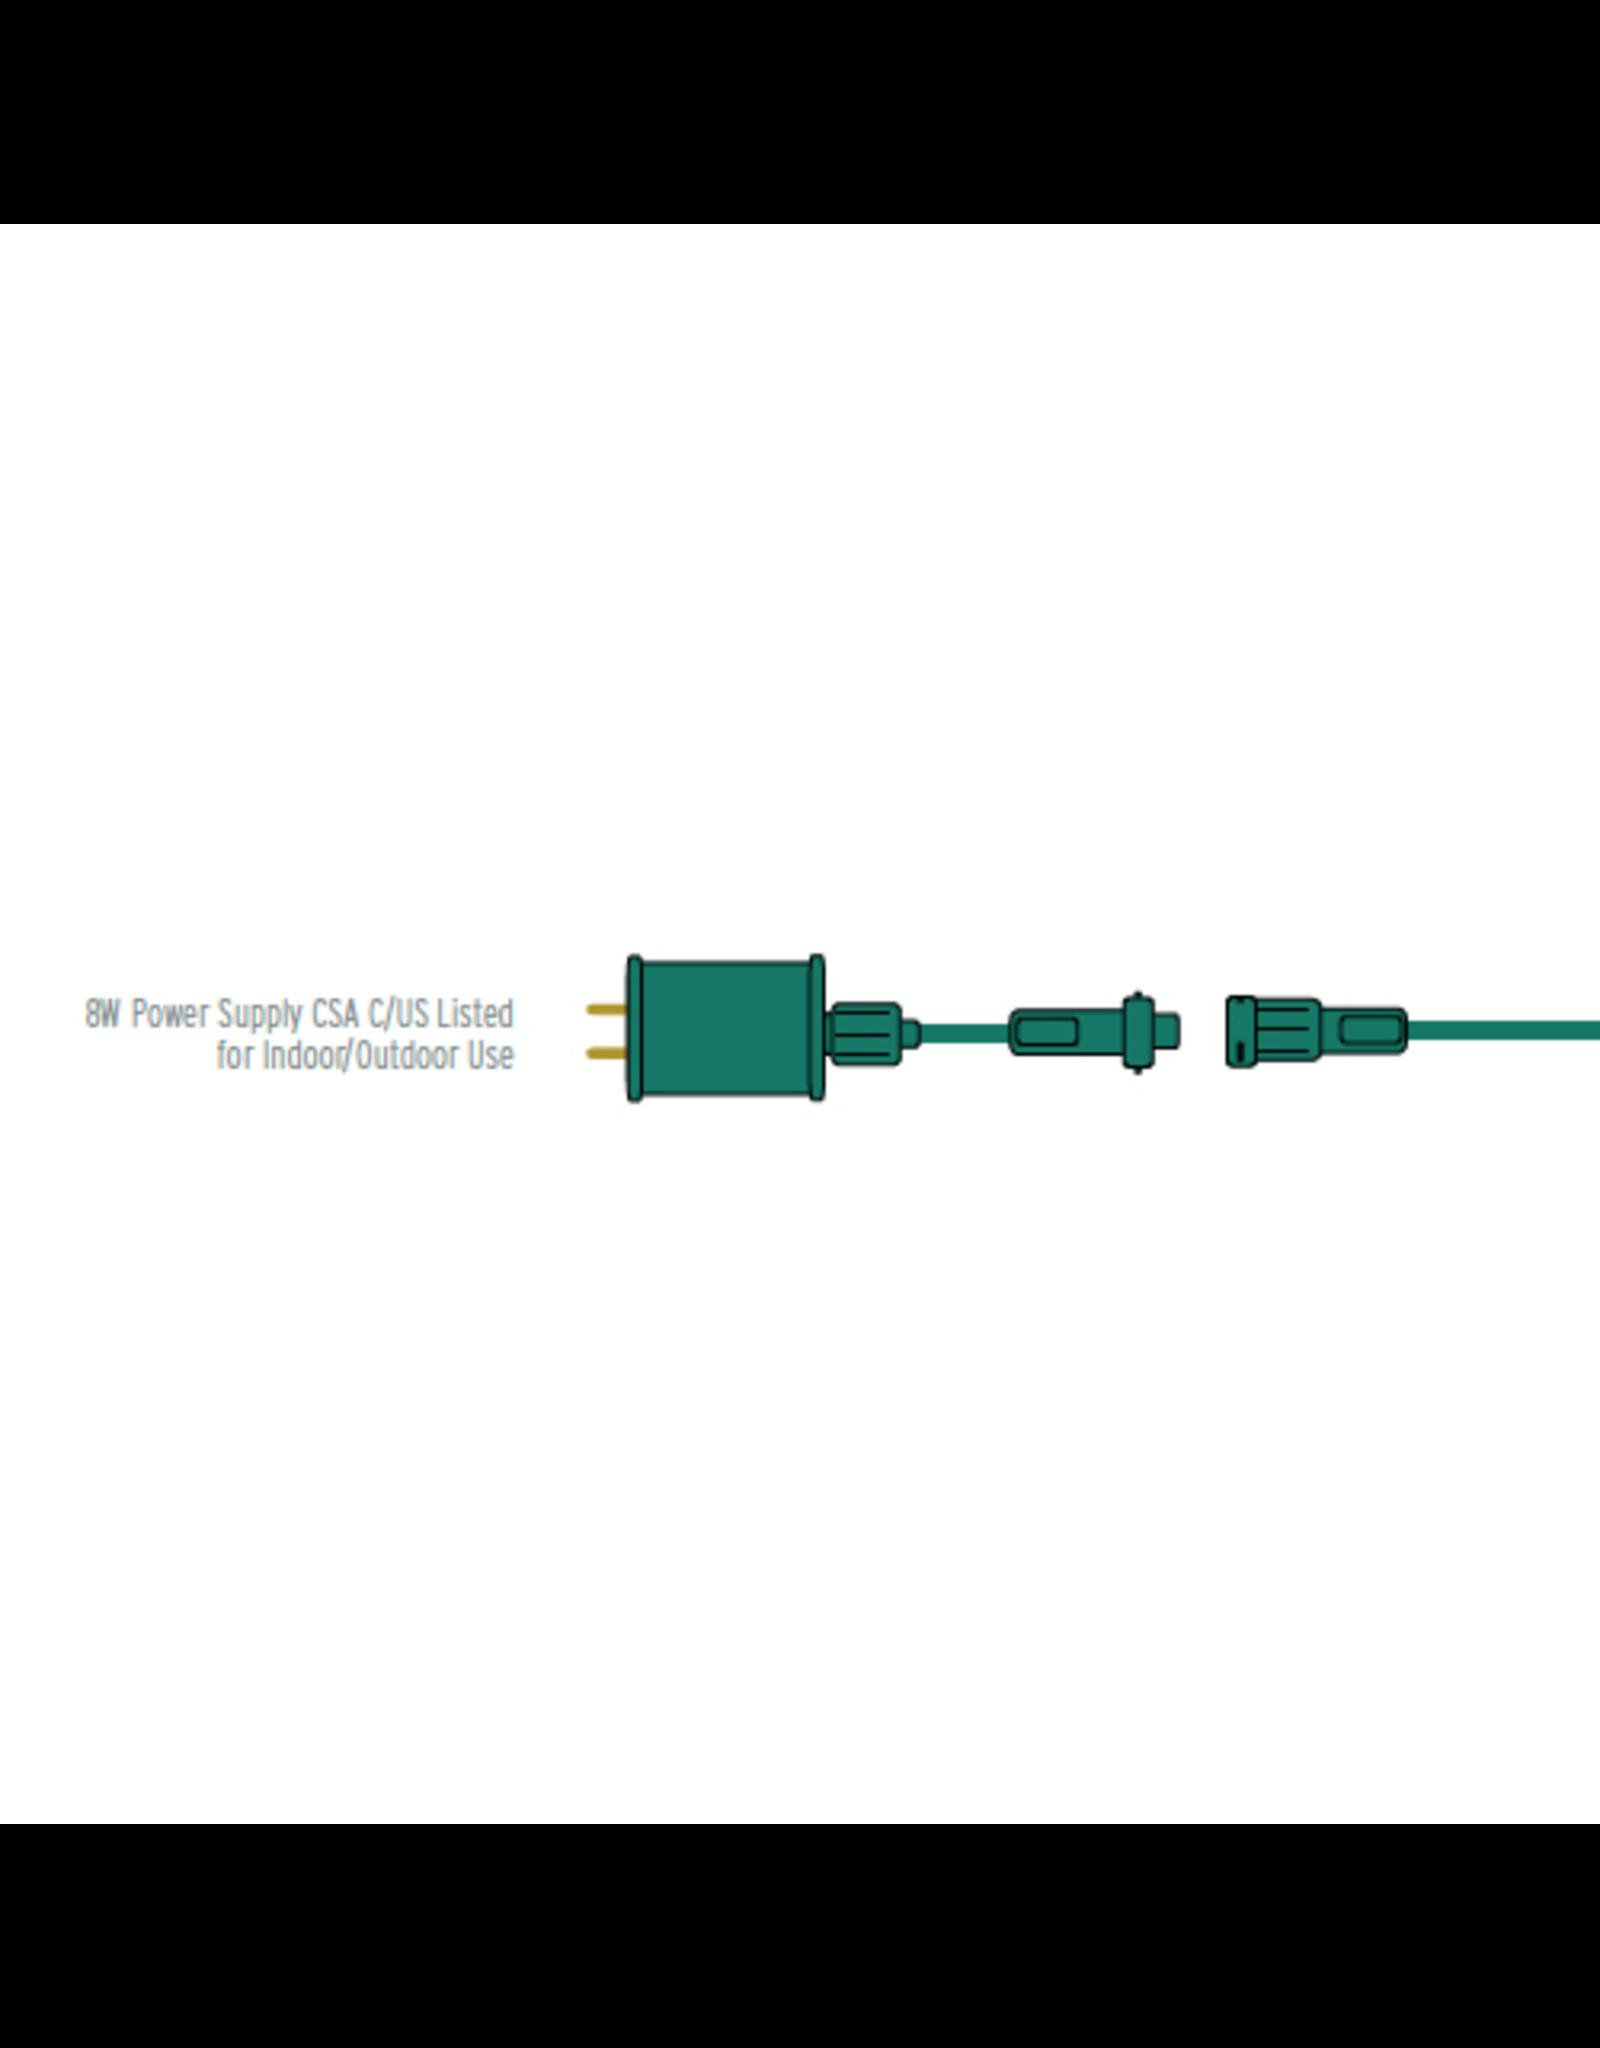 Accessories - 8W Power Supply